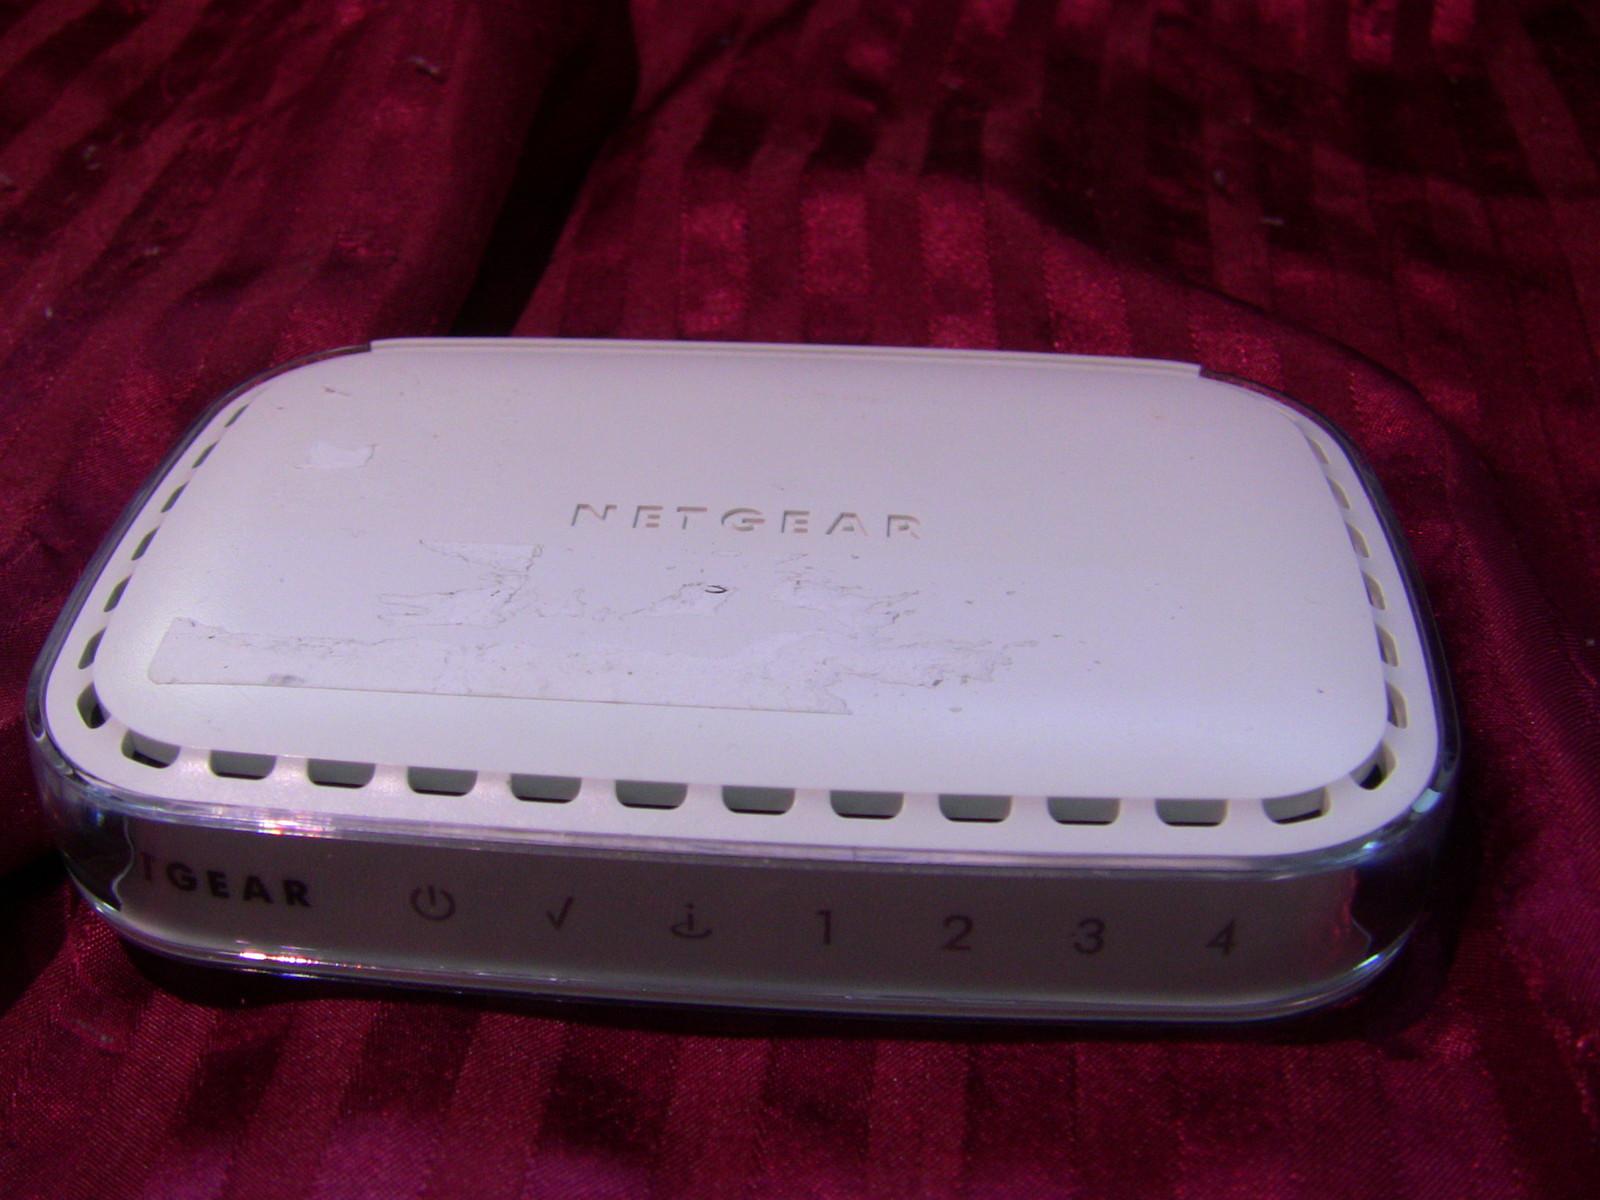 Netgear RP614 v4 4-Port Cable/DSL Web Safe and similar items